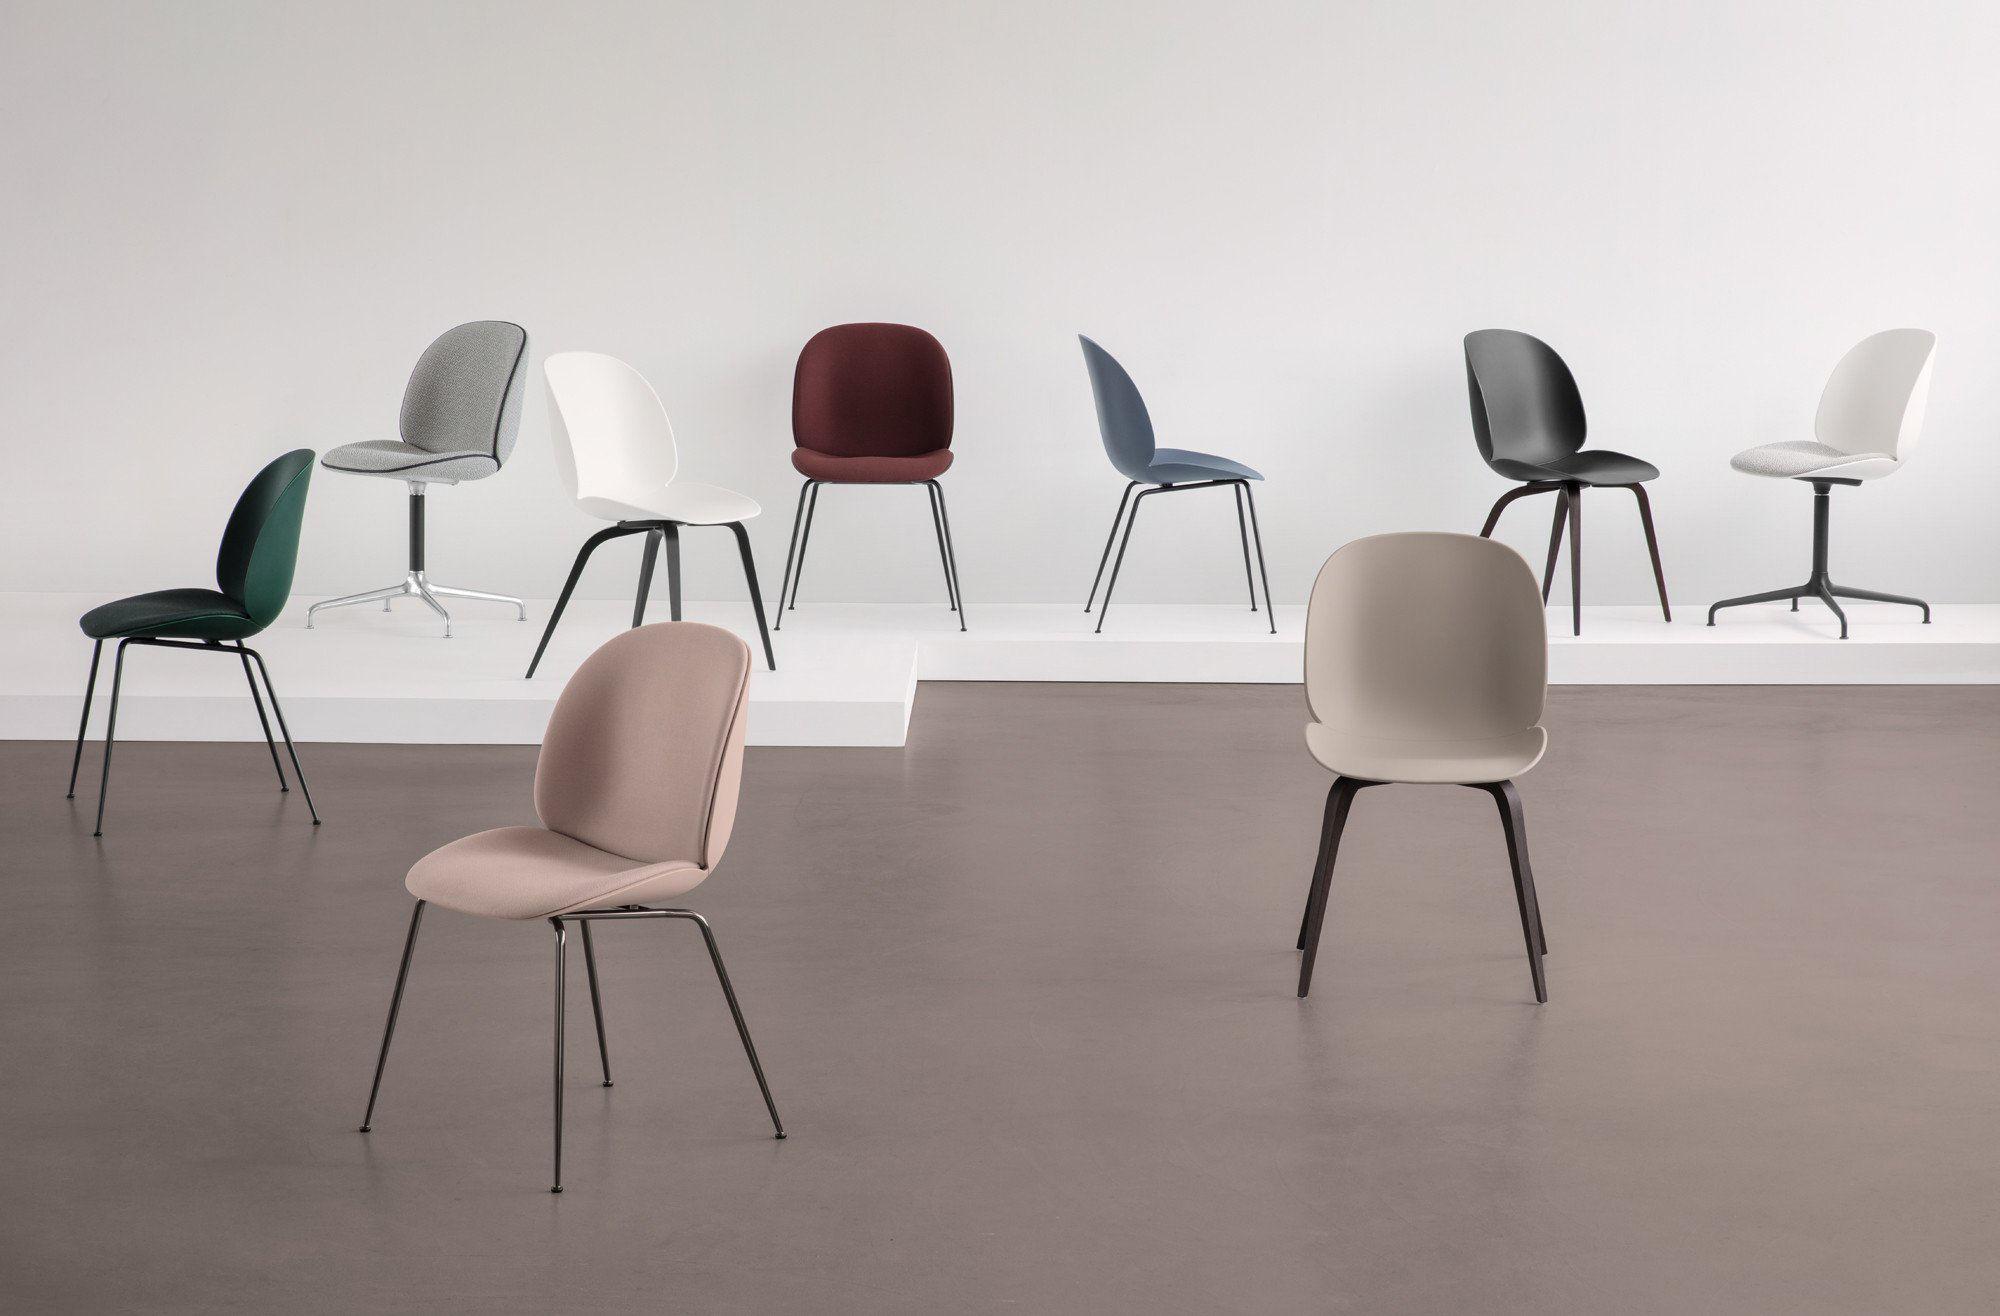 Sedia Imbottita Design : Beetle sedia imbottita gamfratesi plastica & tessuto nero